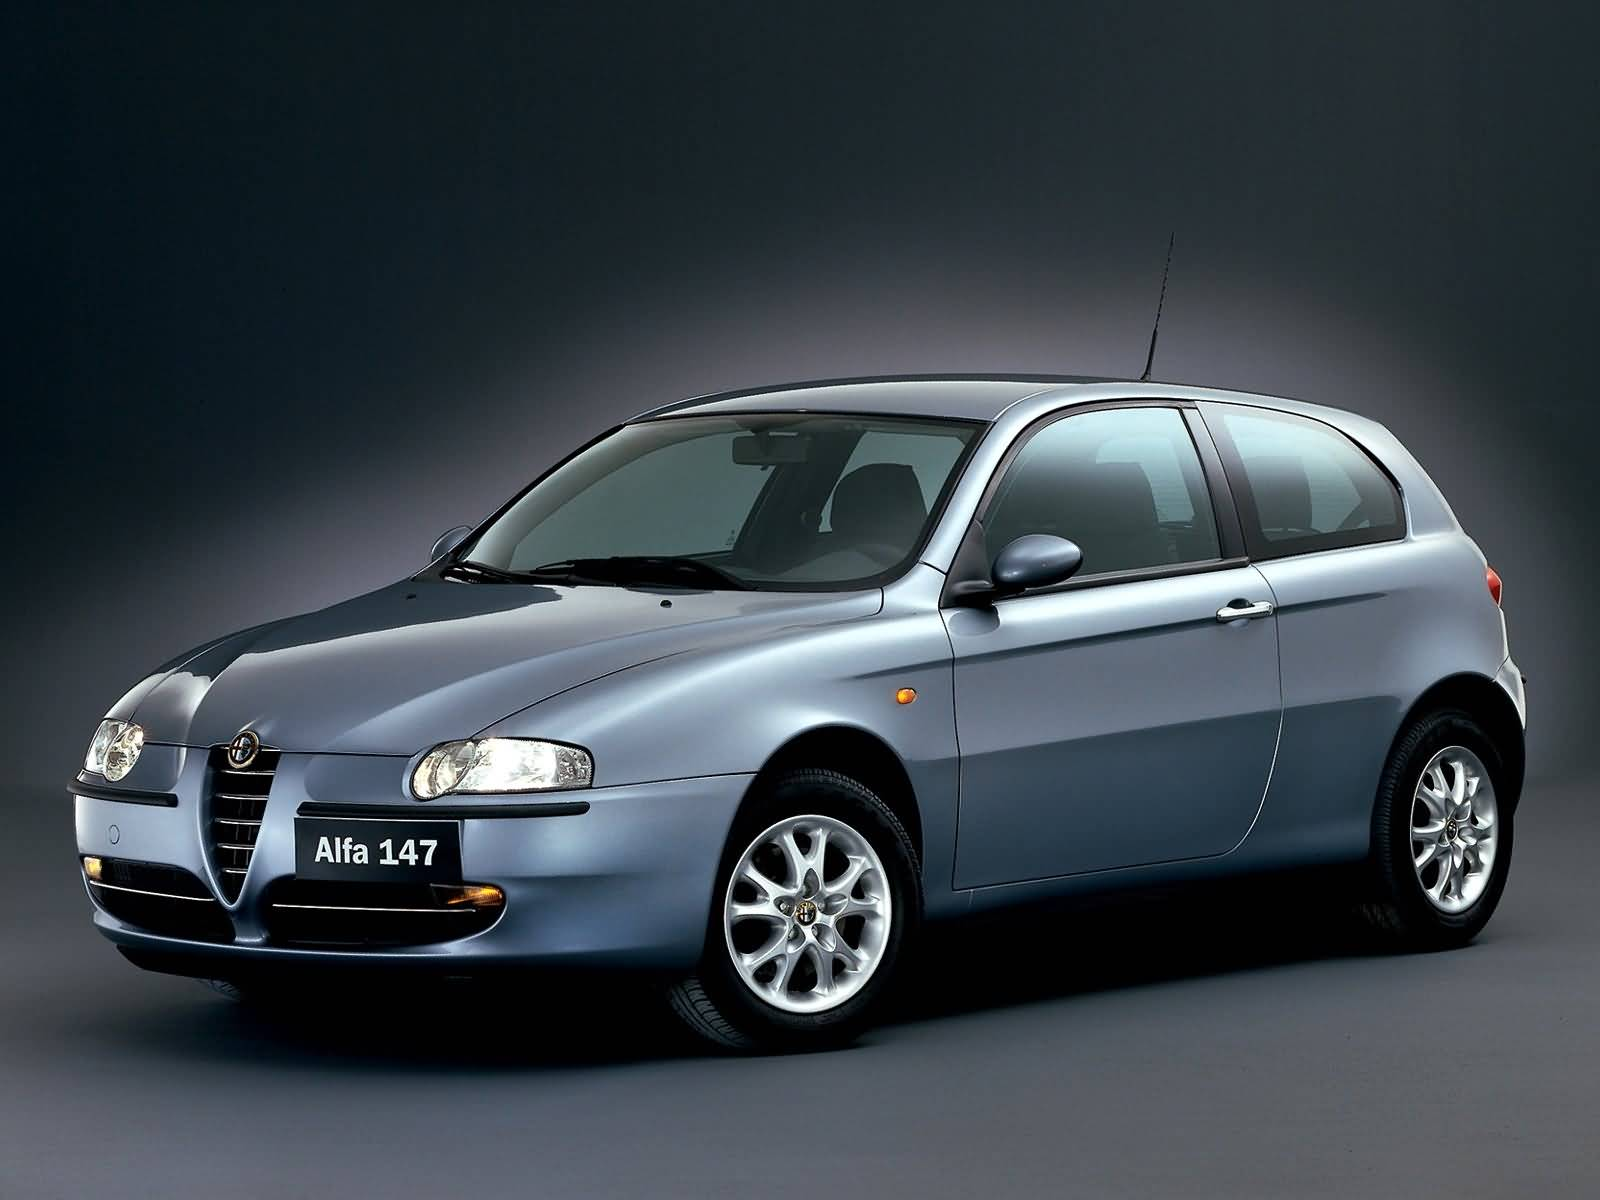 Very fast silver Alfa Romeo 147 Car